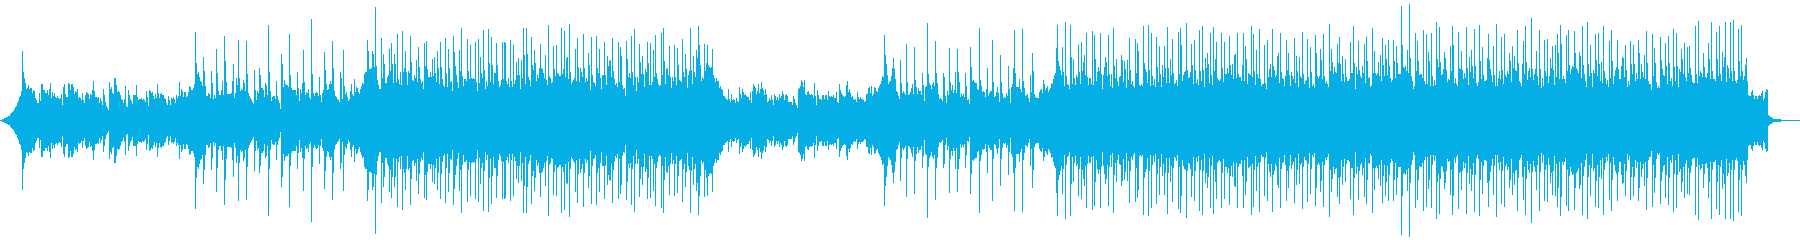 VP系23A、疾走・高揚・躍動感、ロックの再生済みの波形